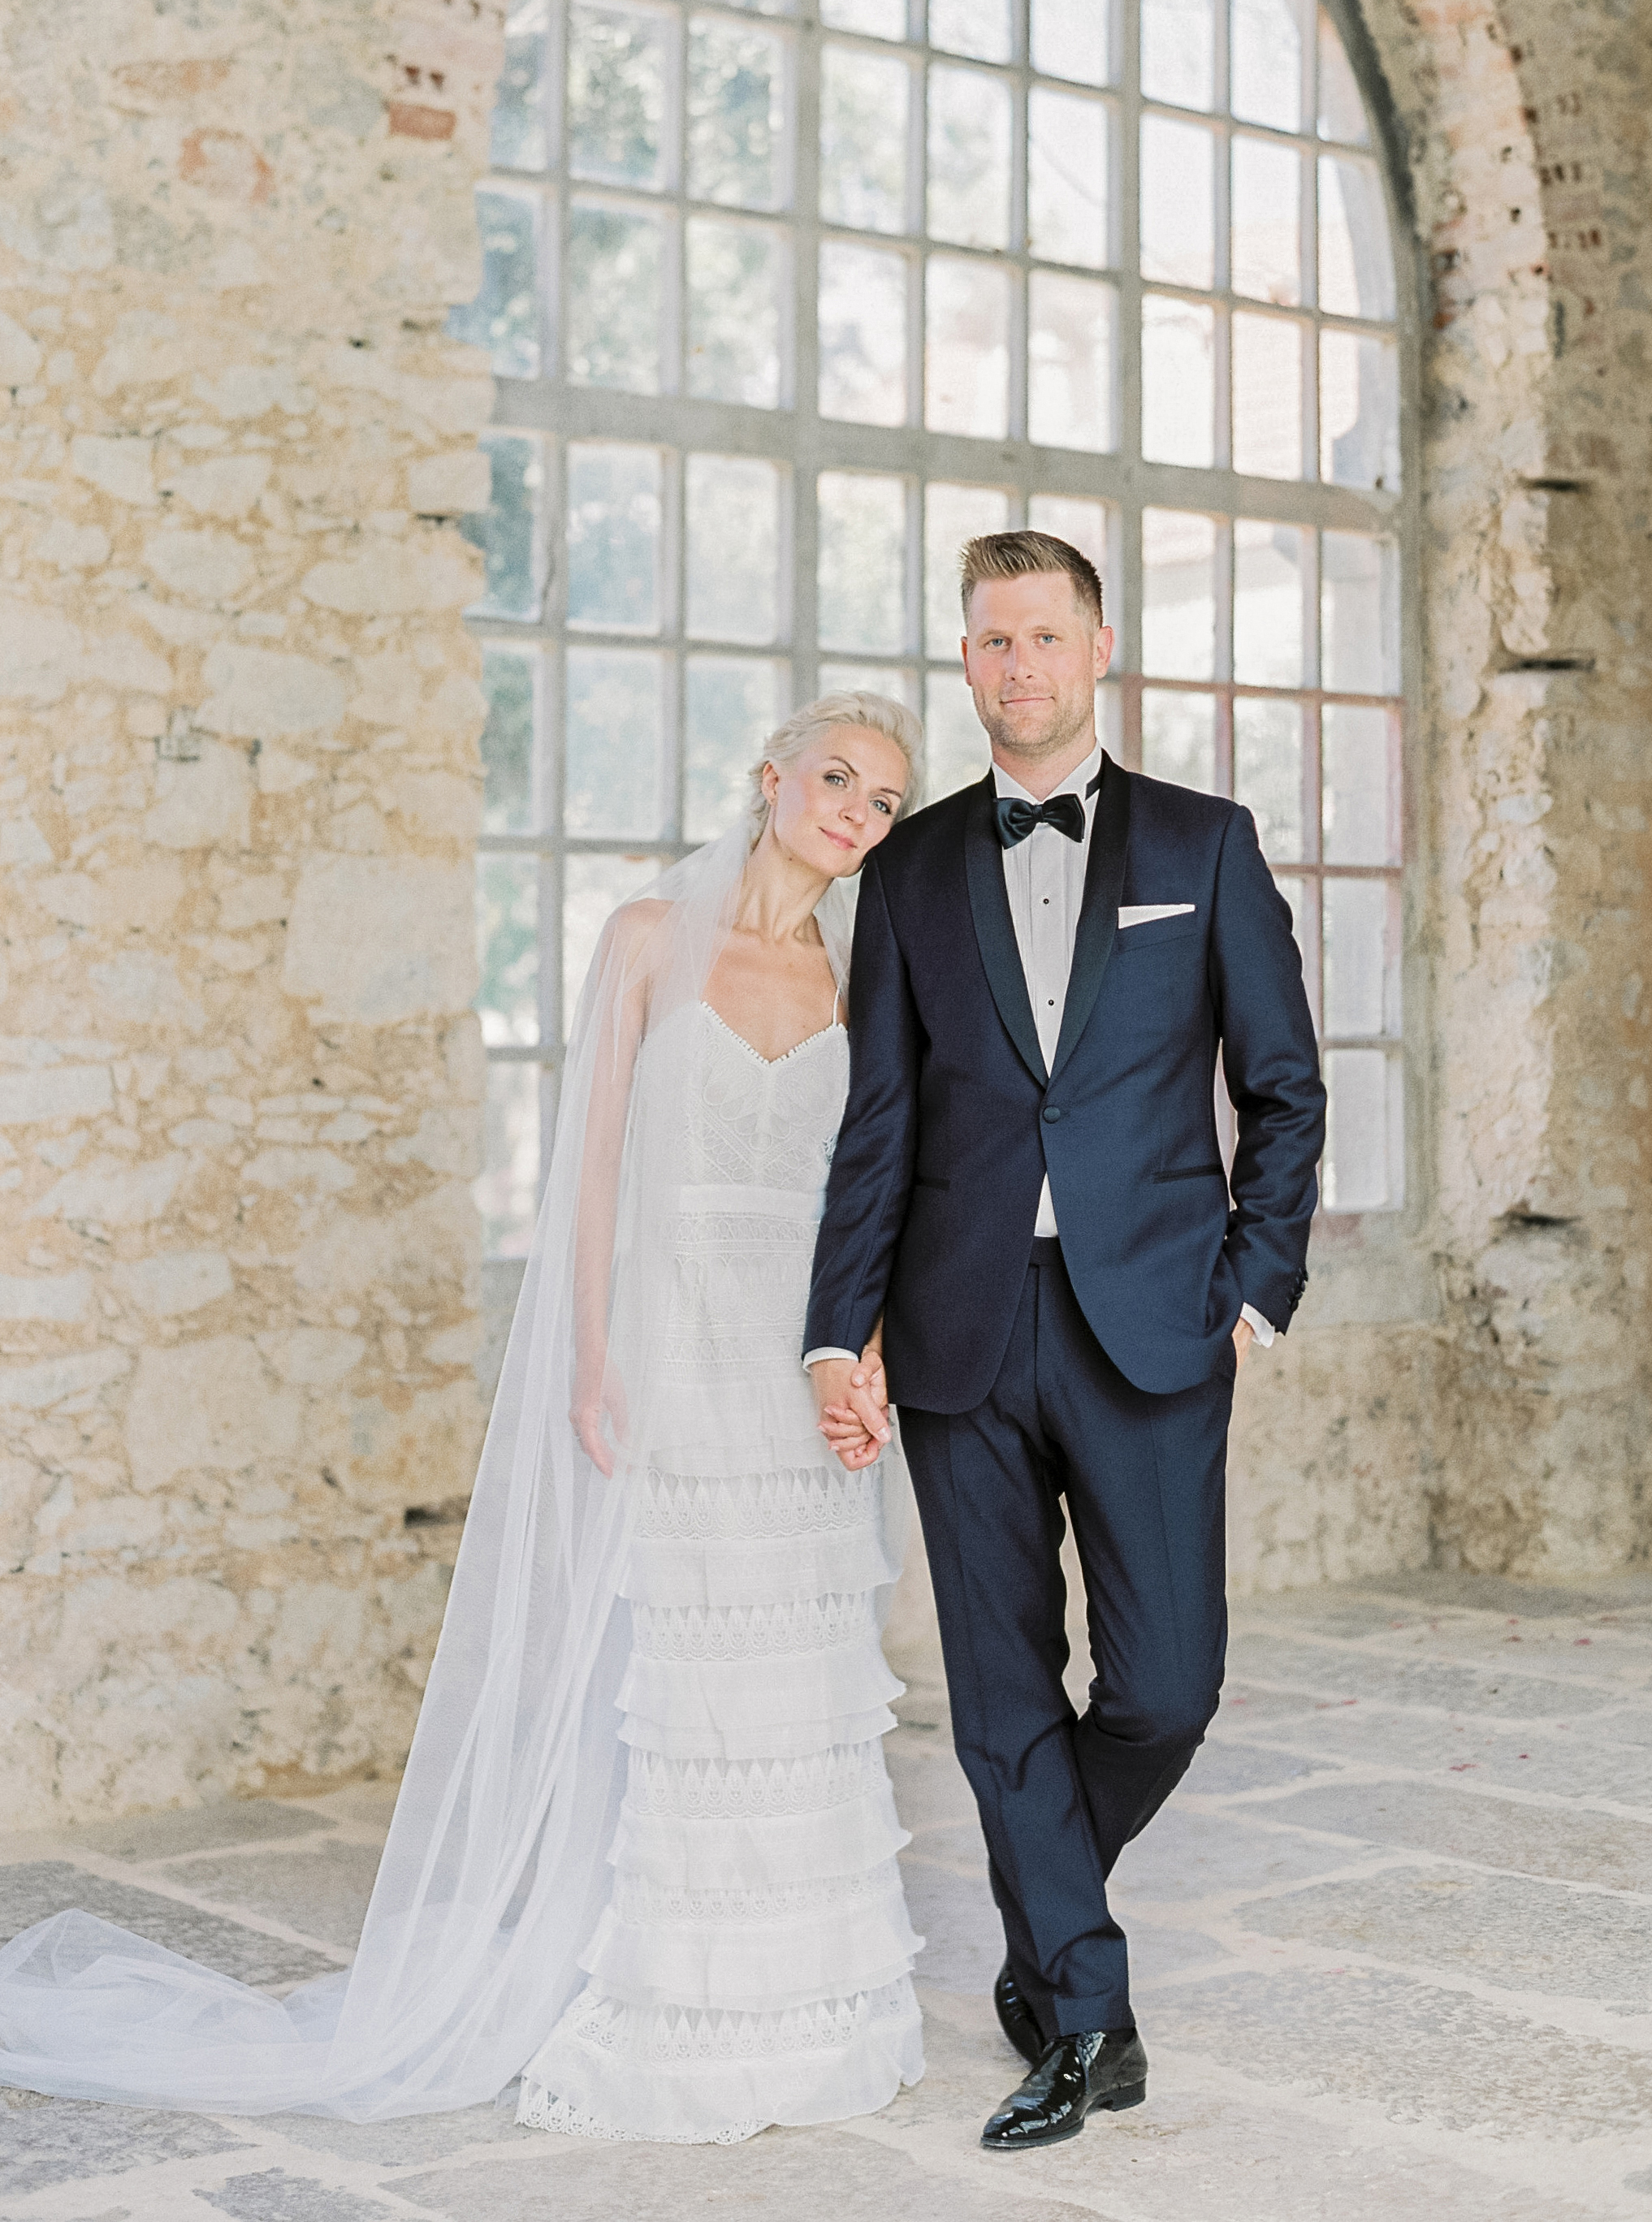 Nastia_Vesna_Photography_Wedding_Portugal_26.jpg